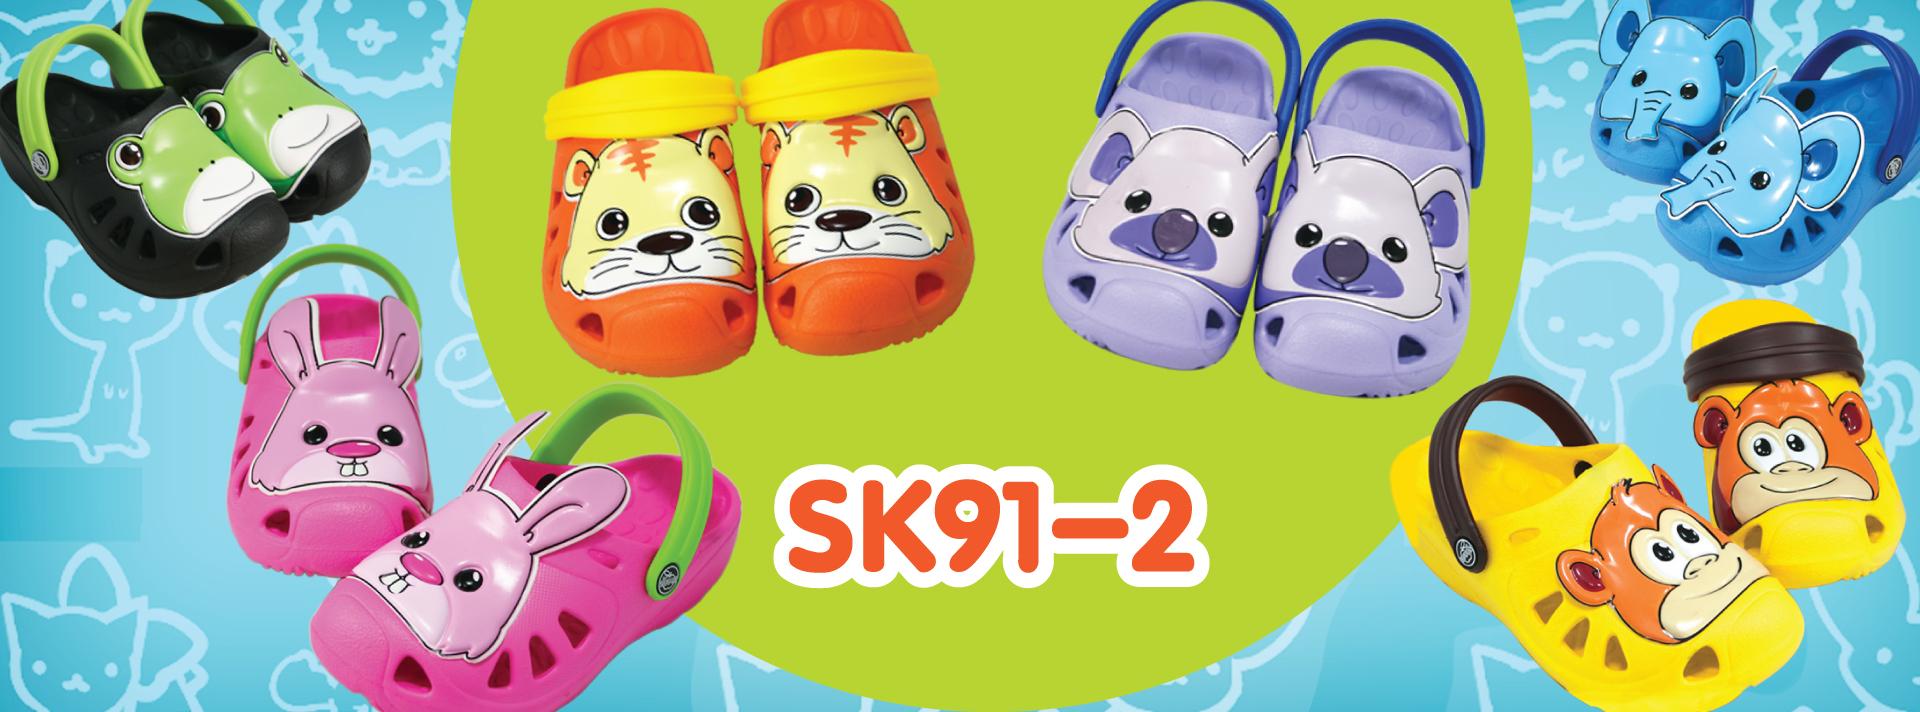 Shoes-SK91-2